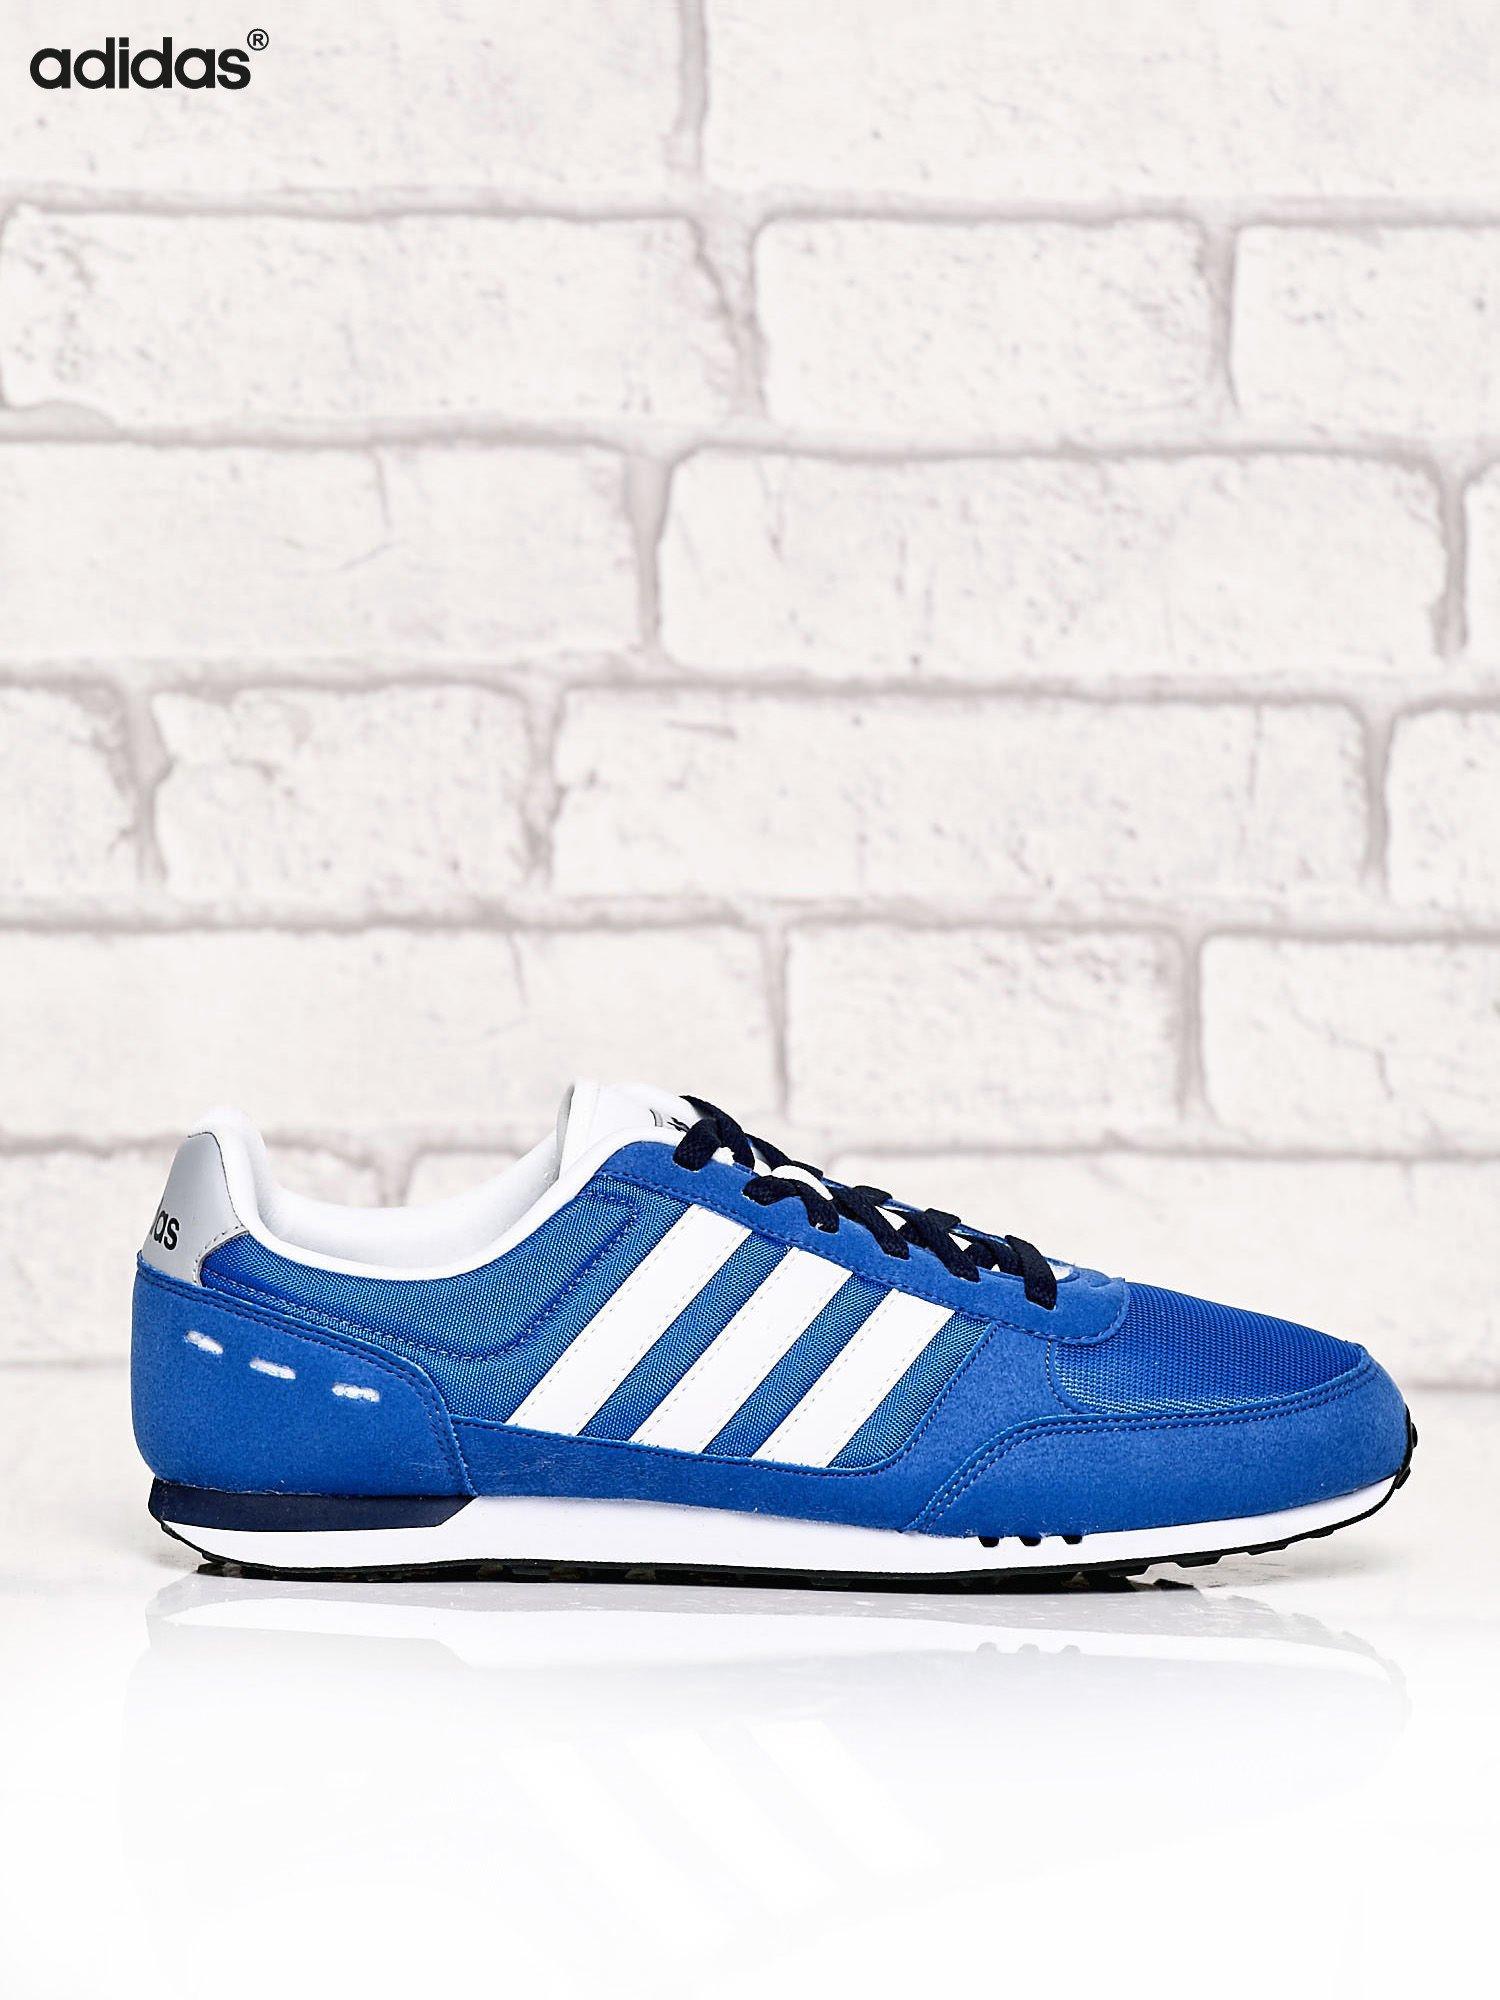 adidas buty damskie neo city racer